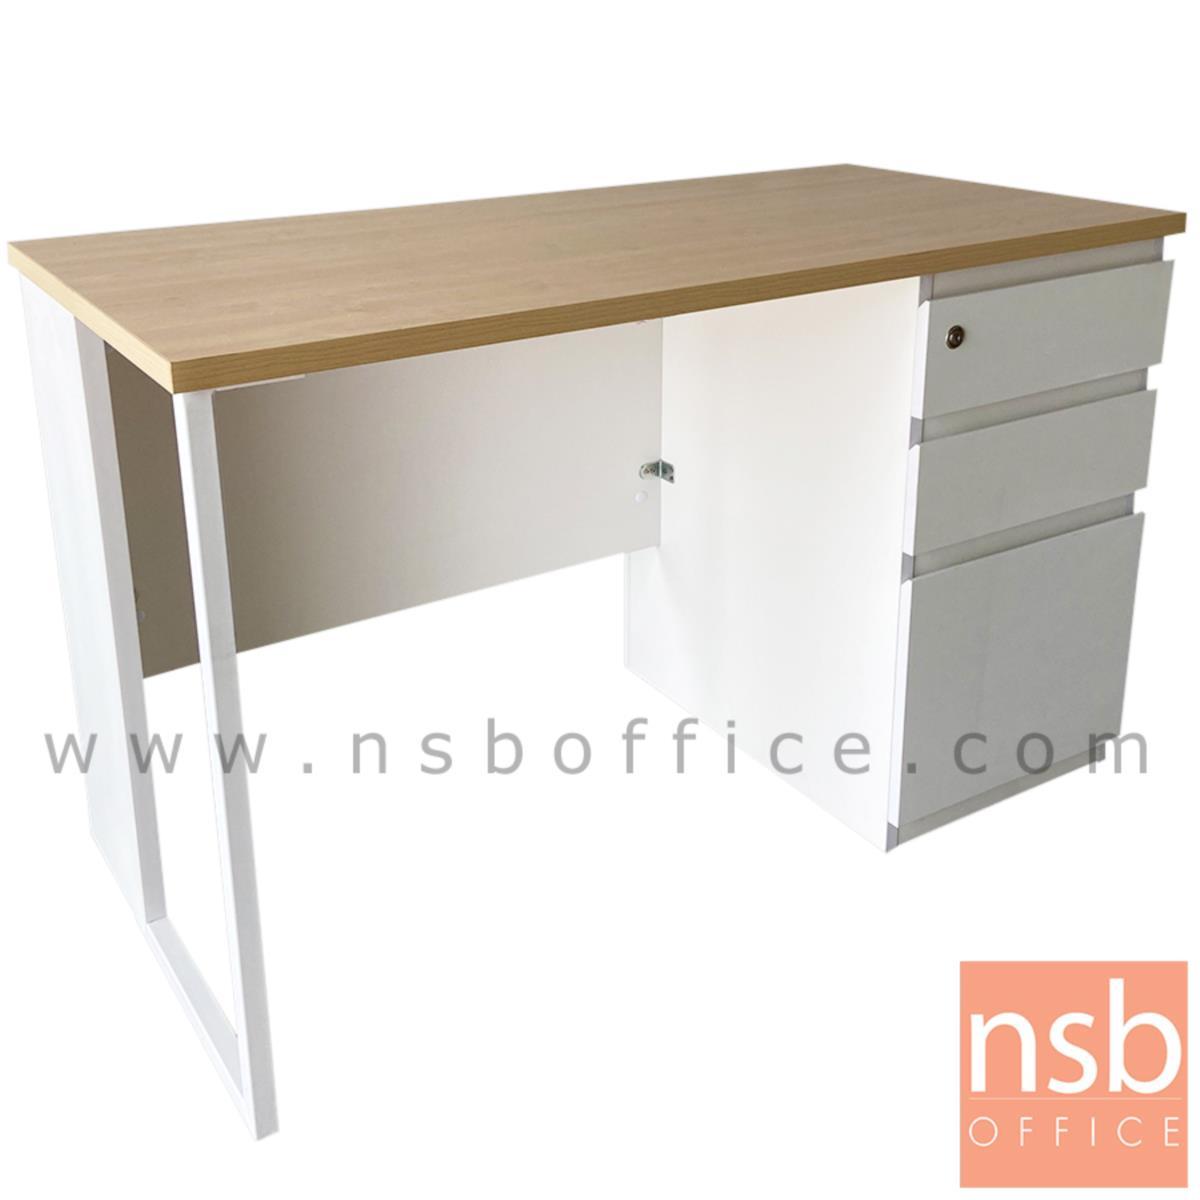 A10A076:โต๊ะทำงานทรงสี่เหลี่ยม 3 ลิ้นชัก  รุ่น Elwood (เอลวูด) ขนาด 120W ,135W ,150W ,160W ,180W*60D ,75D cm.  ขาเหล็กกล่องพ่นขาว